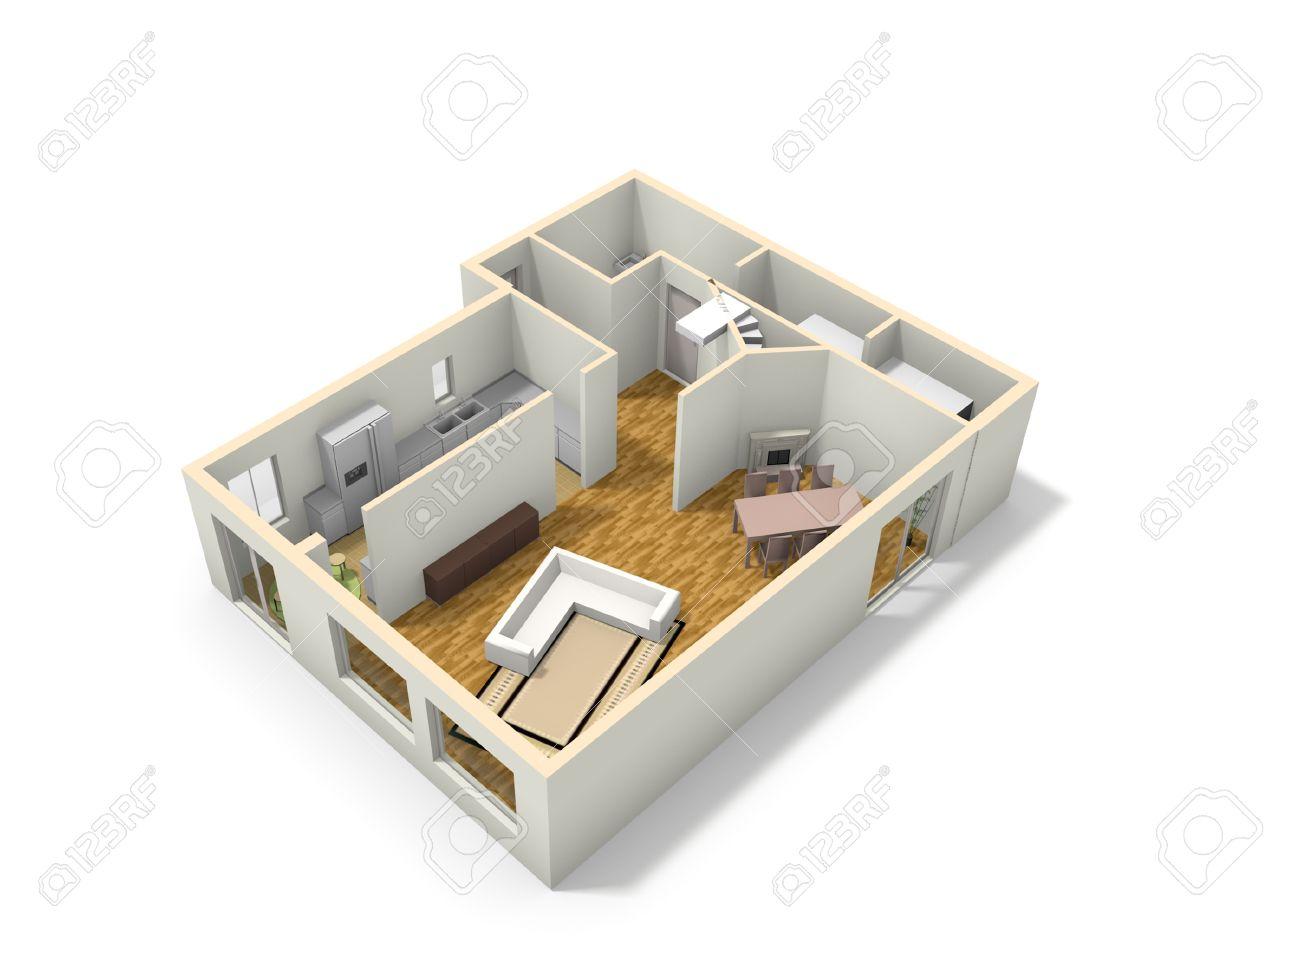 3d plattegrond van het huis met keuken, woonkamer, eetkamer rom, Deco ideeën